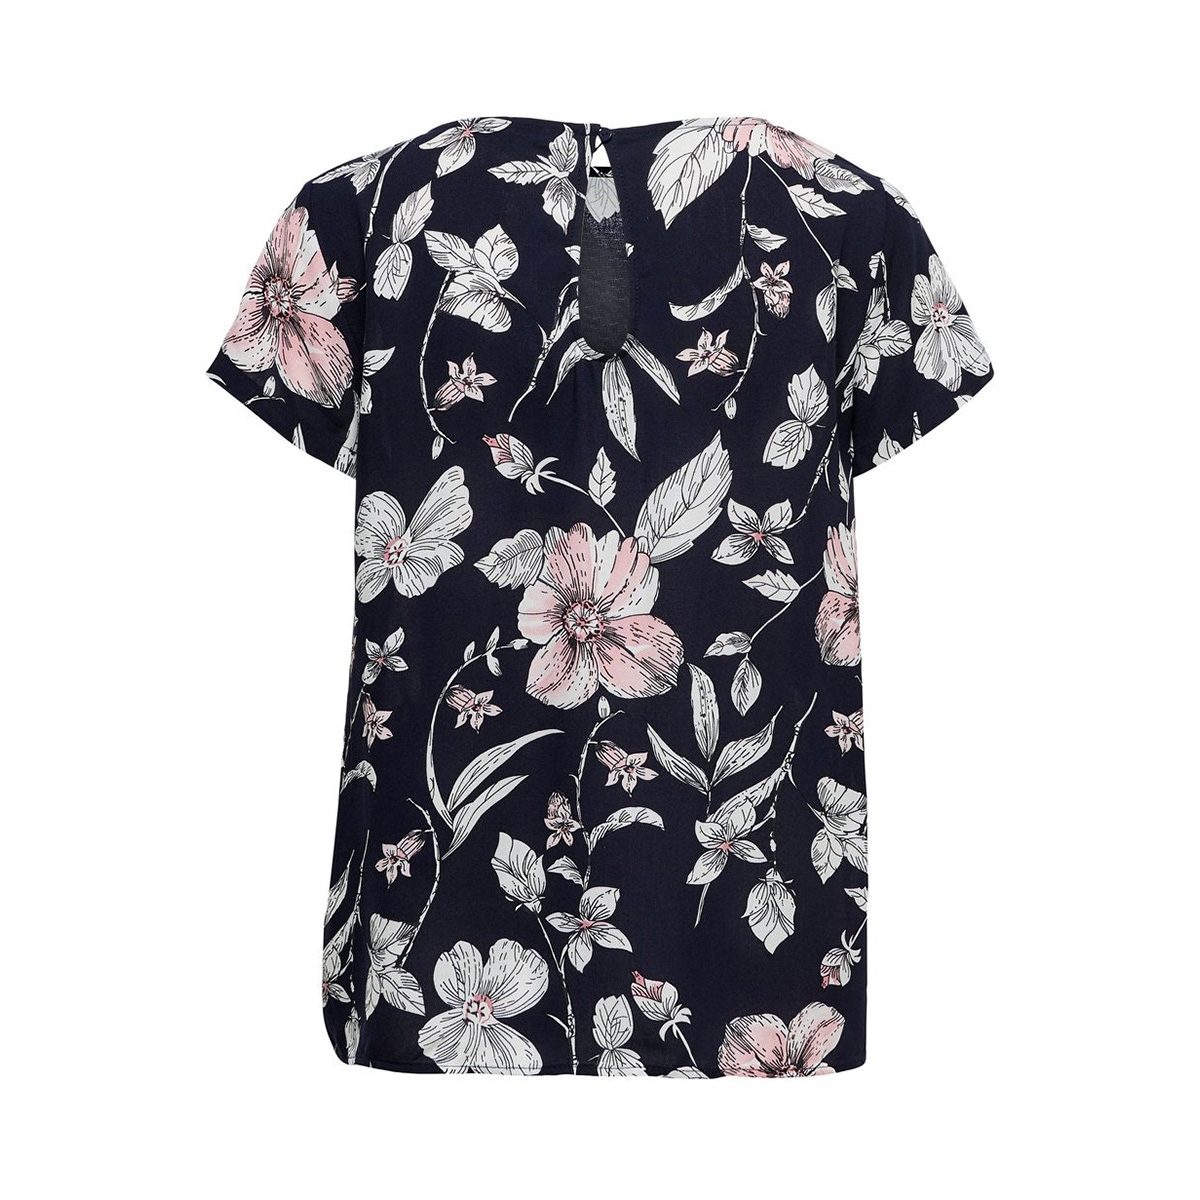 onlfirst one life ss aop top noos w 15198608 only t-shirt night sky/flower lea